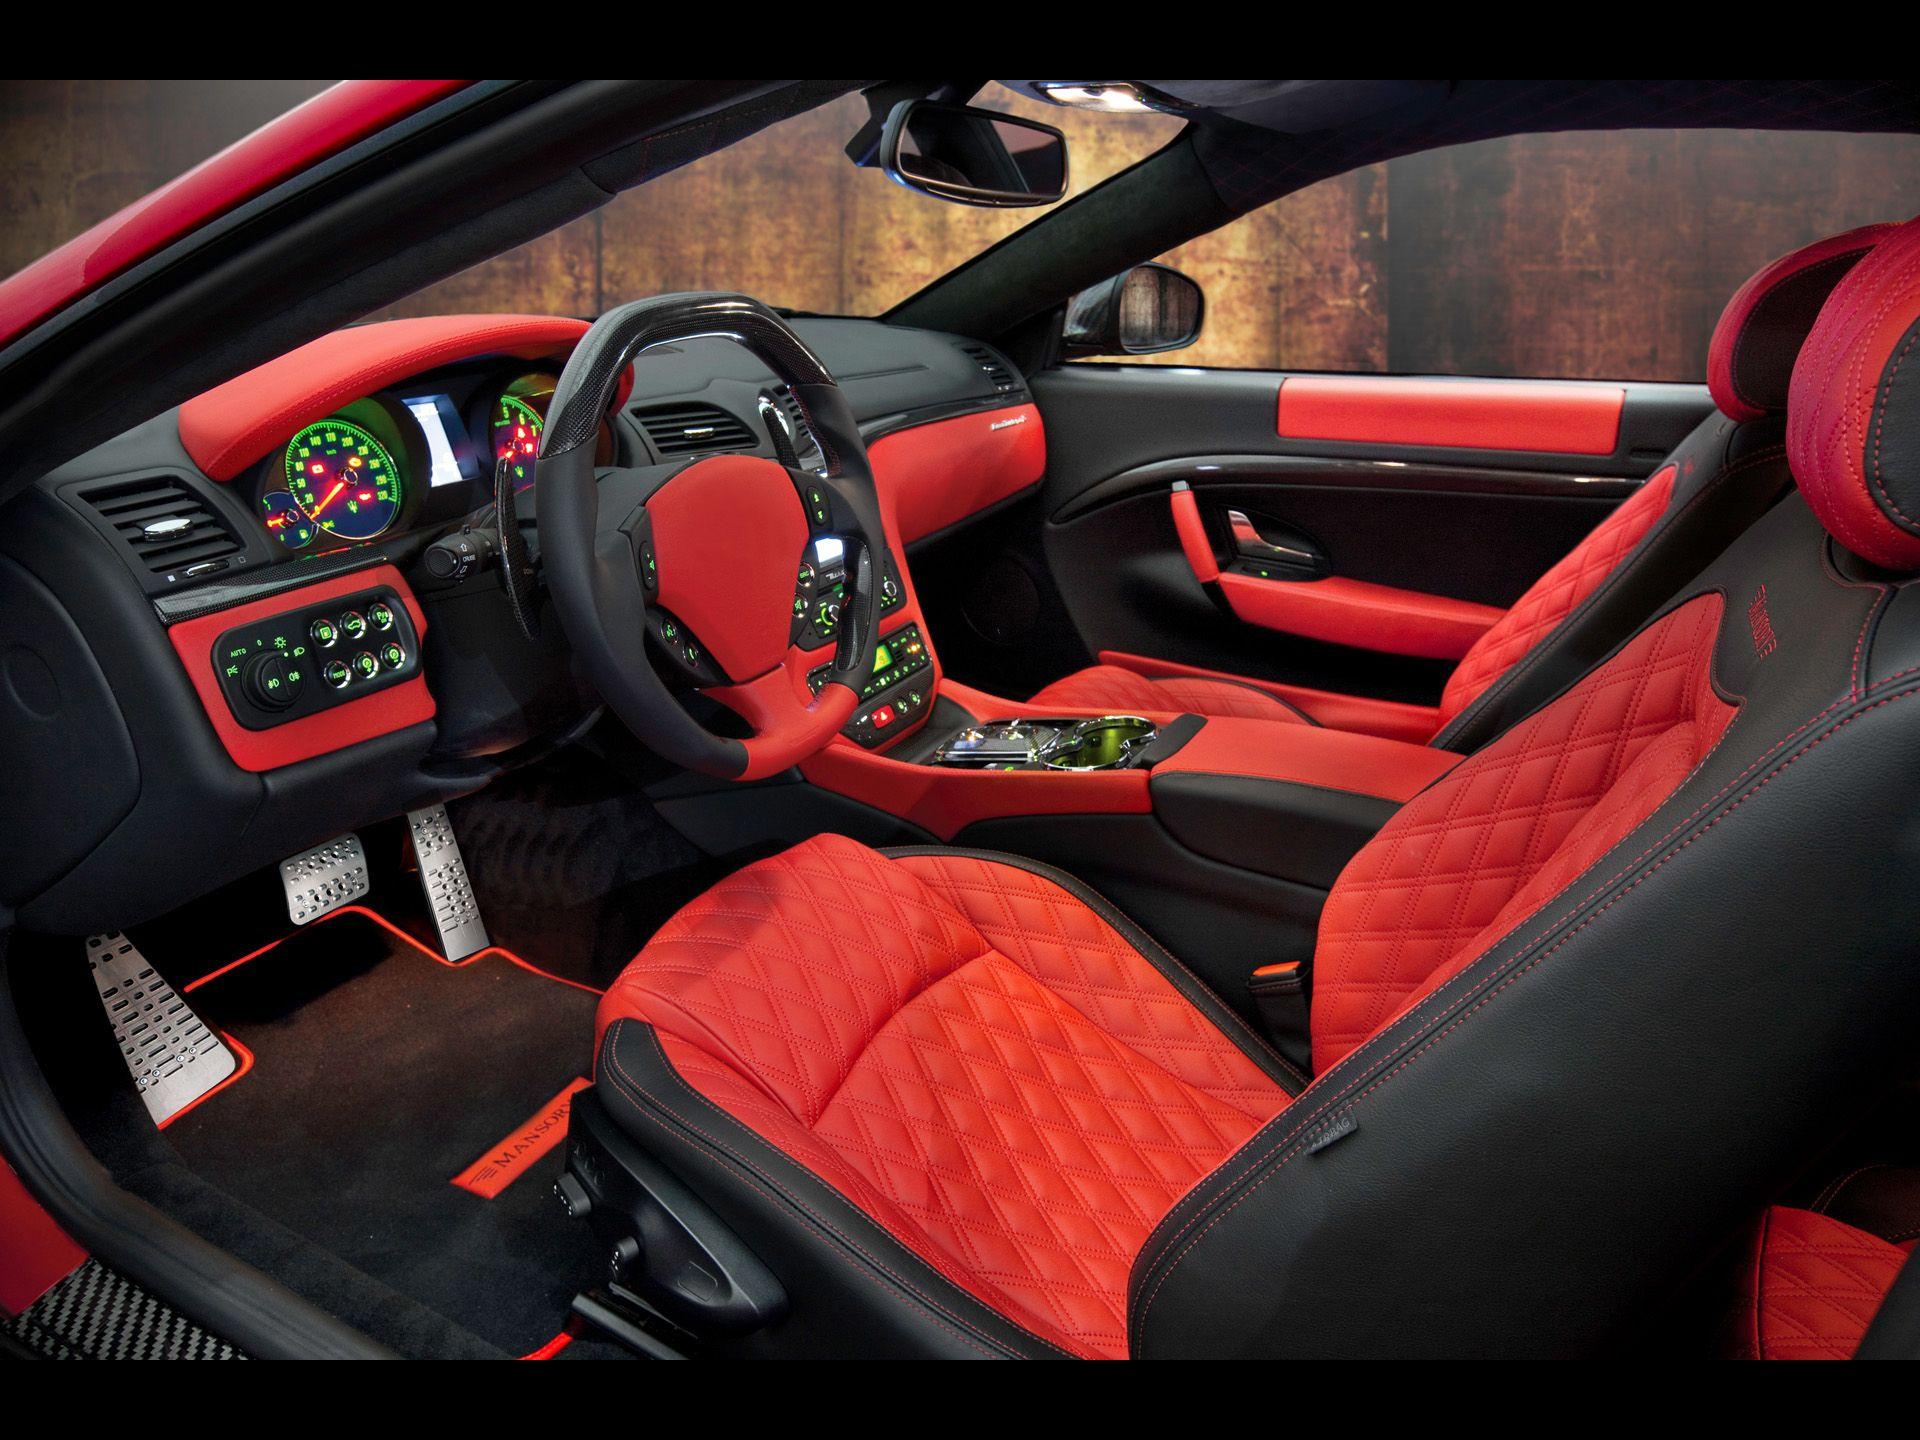 2011 mansory maserati granturismo interior cars - Maserati granturismo red interior ...